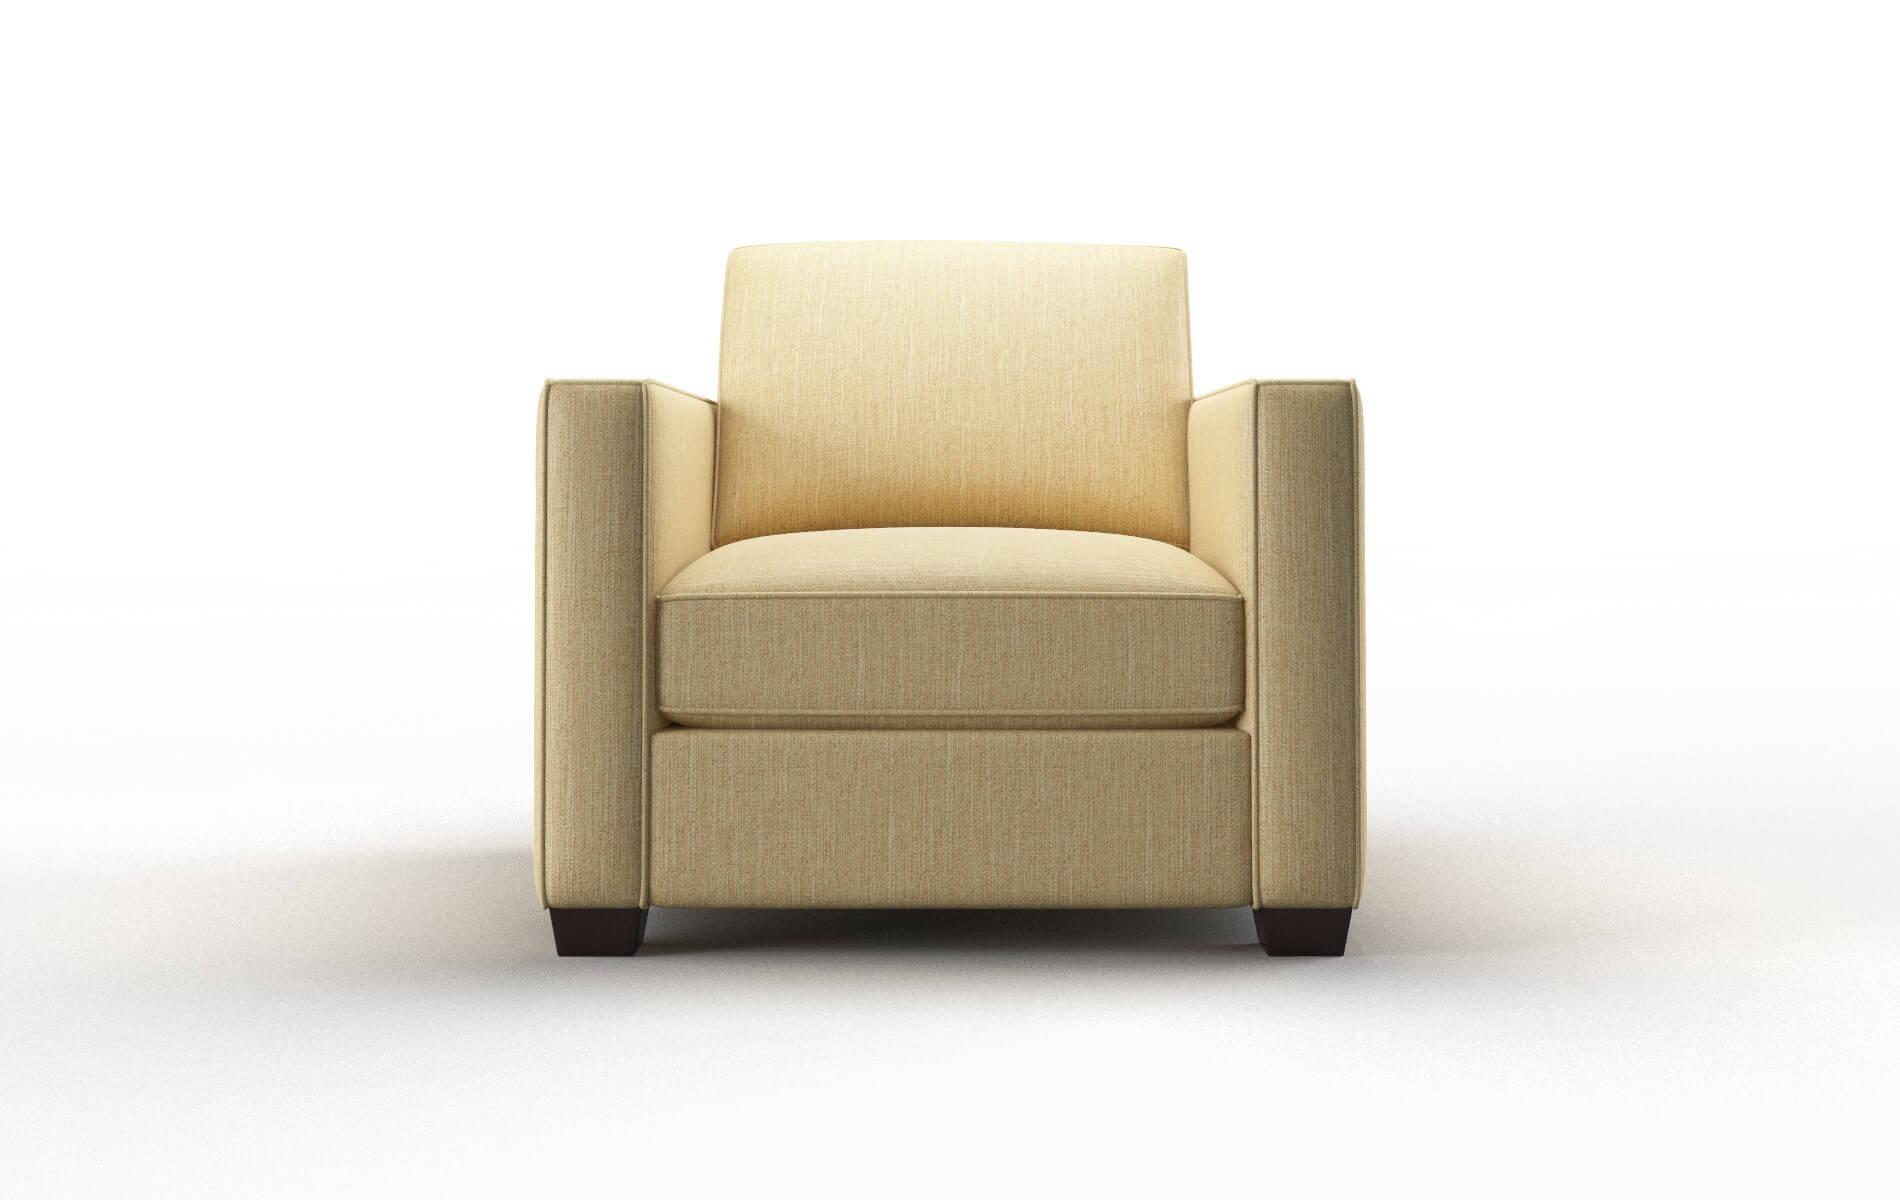 Calgary Malibu Maize Chair espresso legs 1